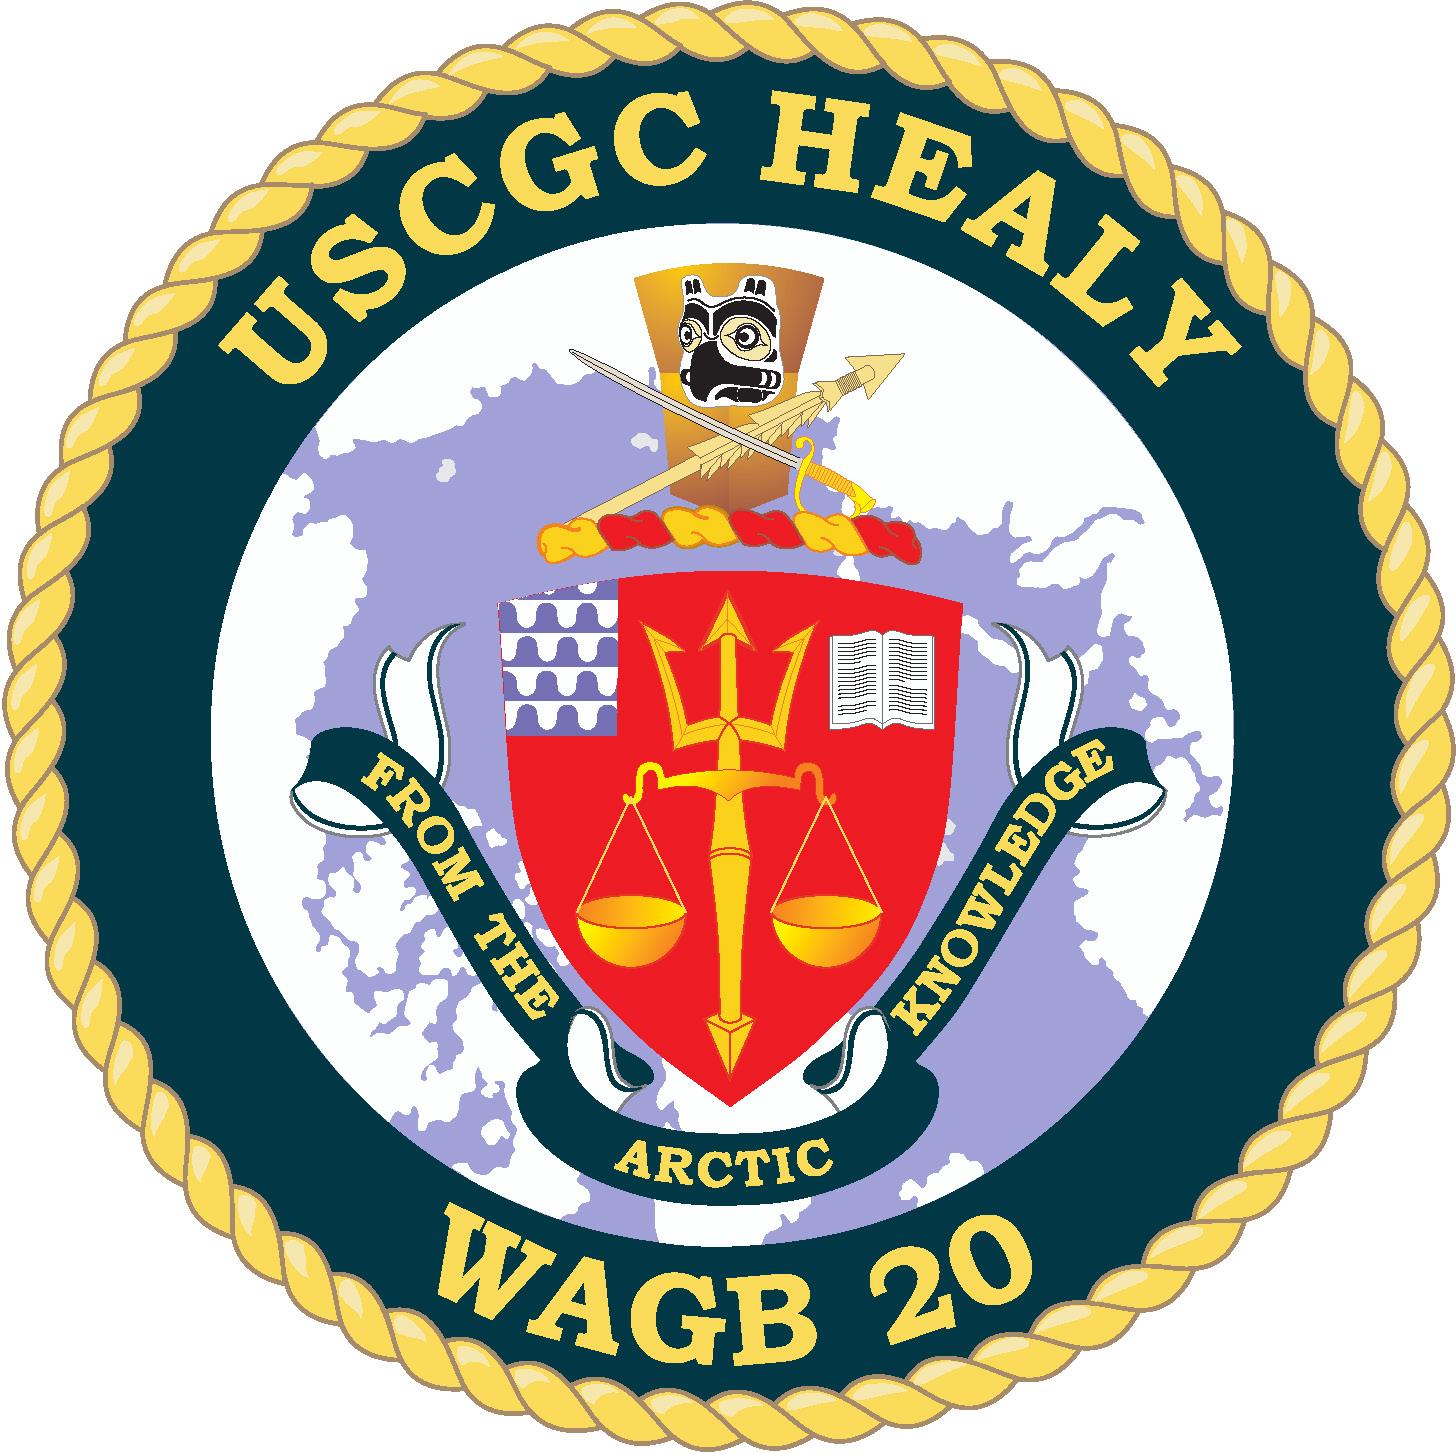 USCGC Healy crest.jpg